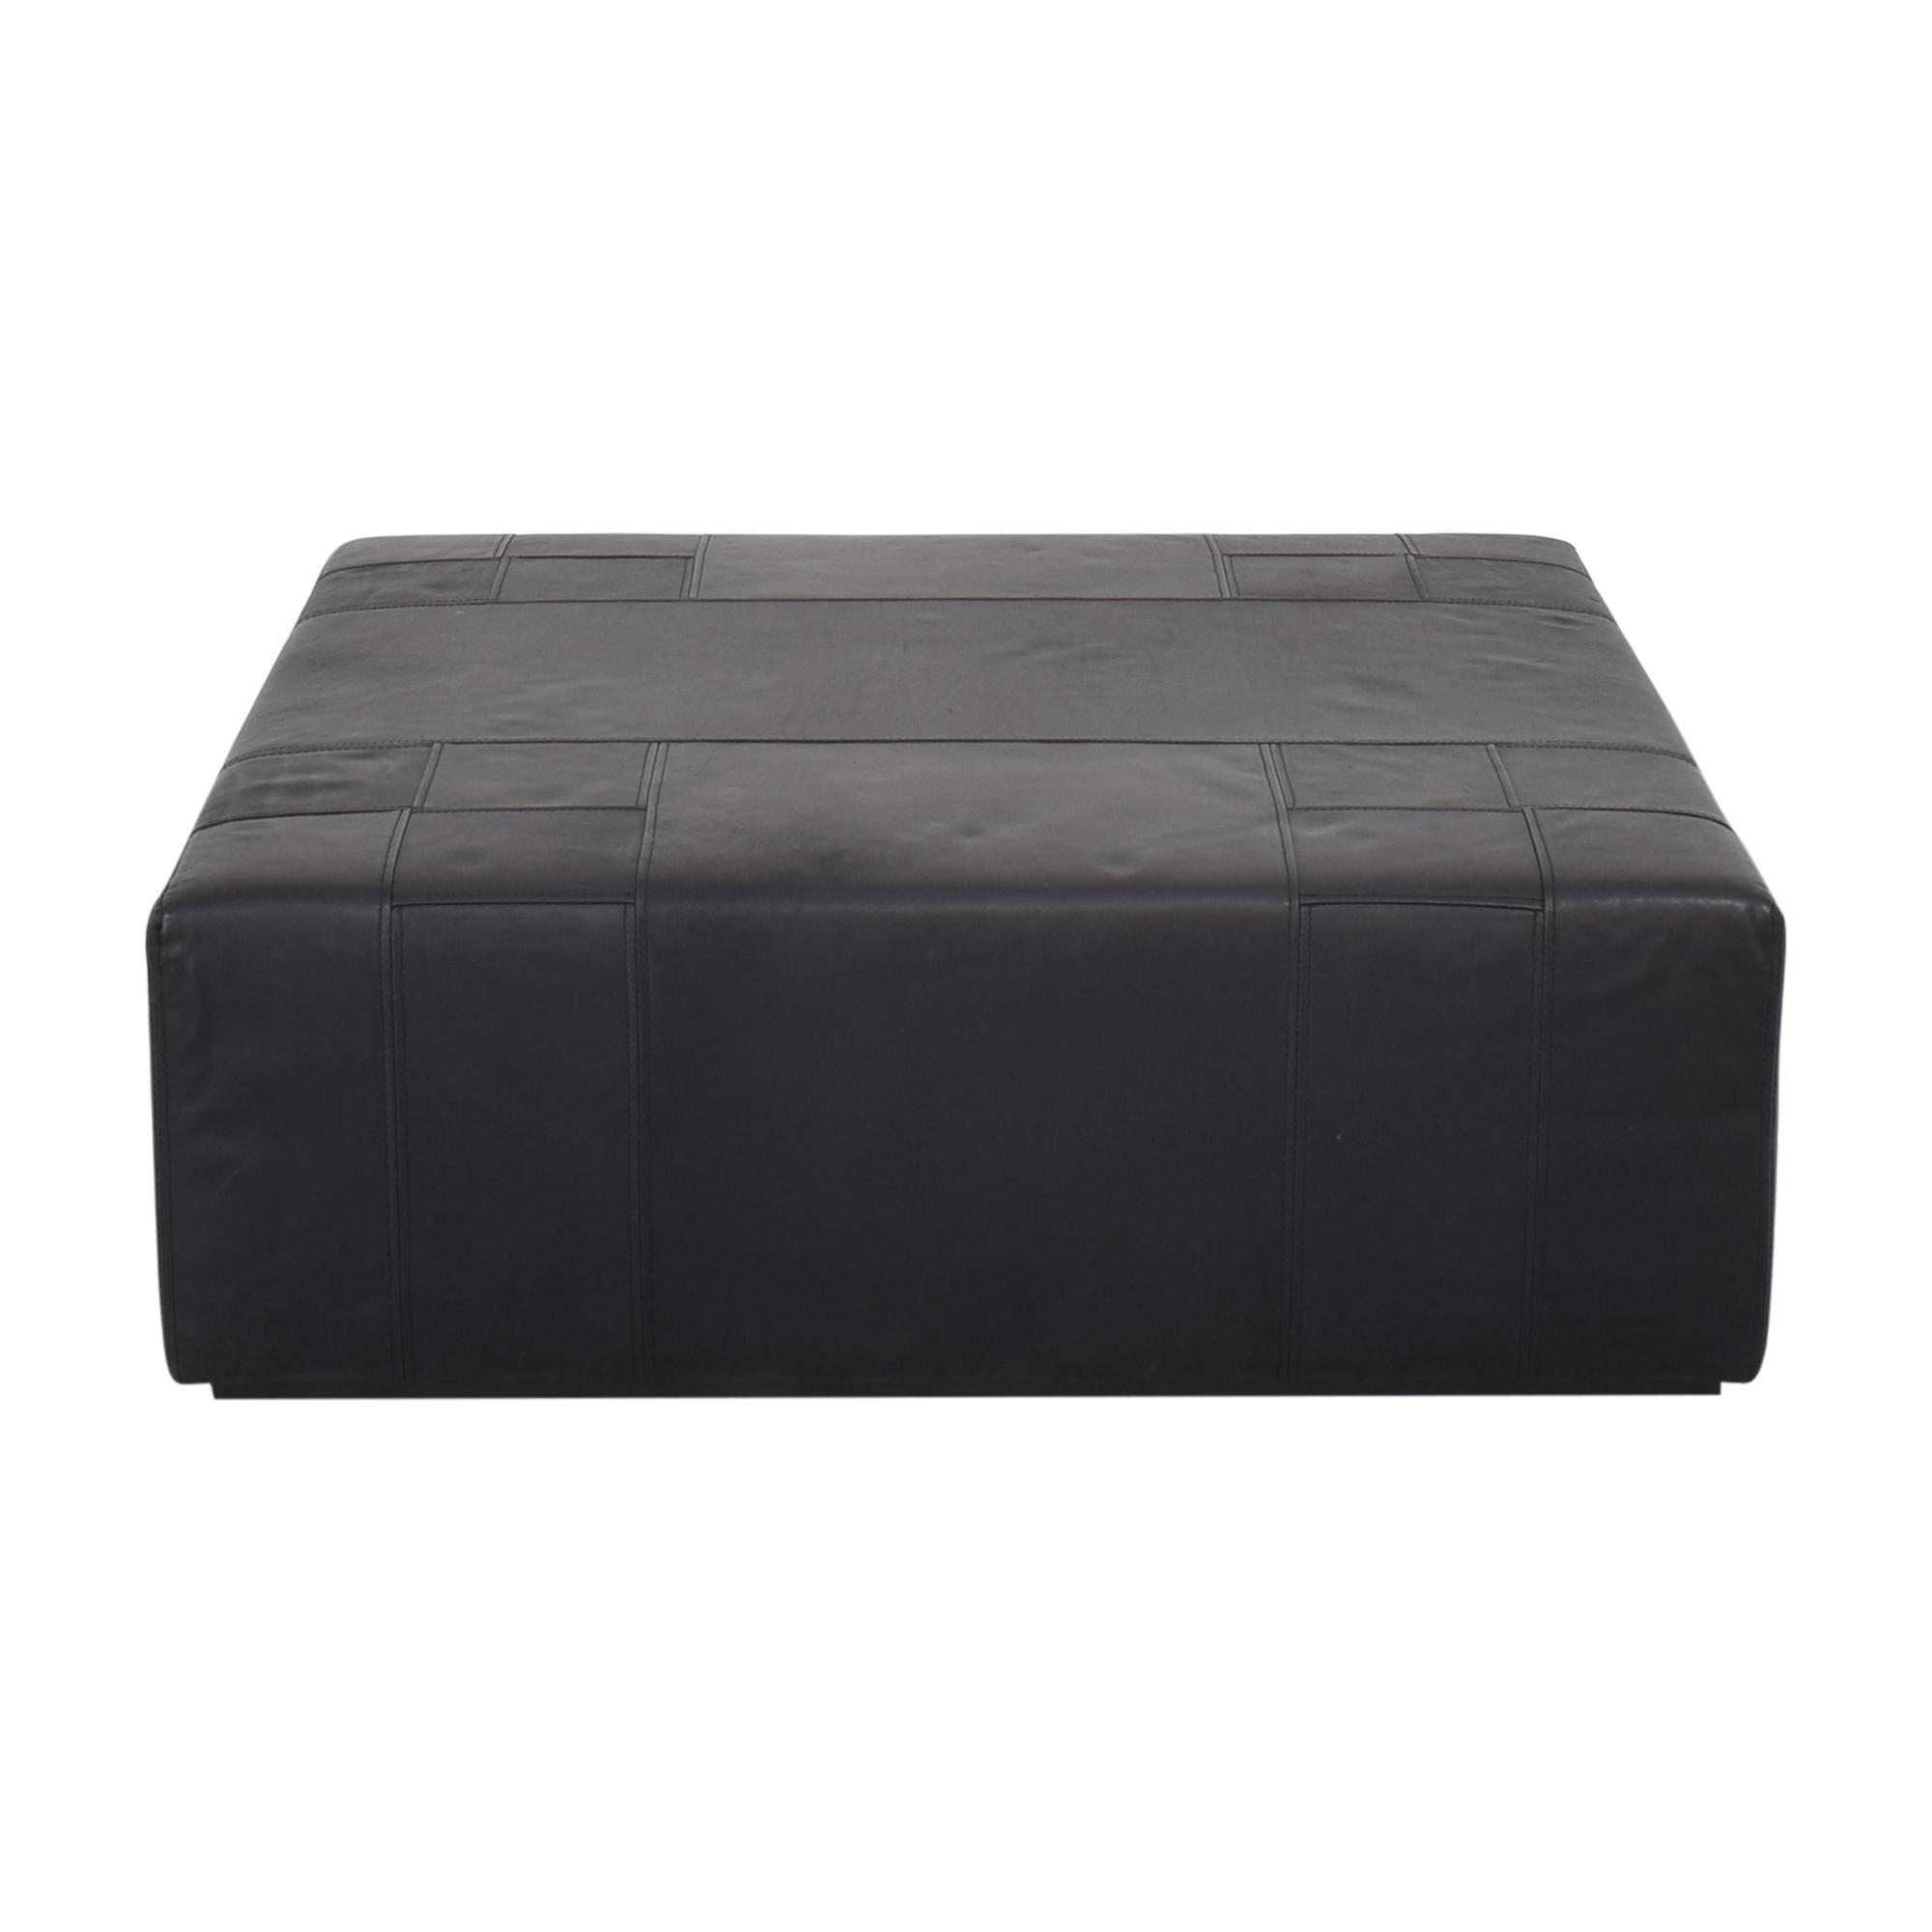 ABC Carpet & Home ABC Carpet & Home Square Ottoman black